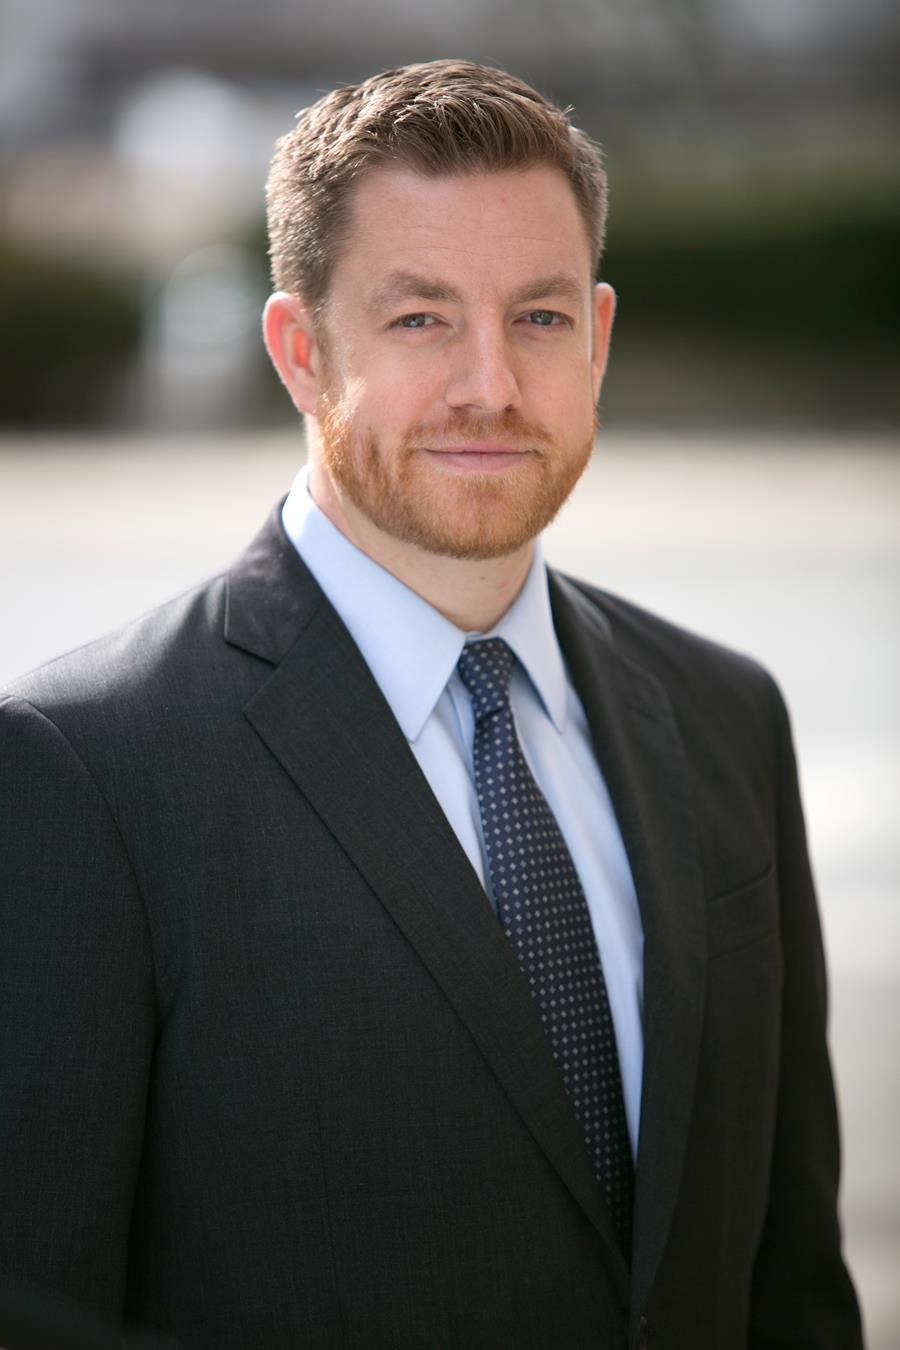 Scott Bartone, CFA